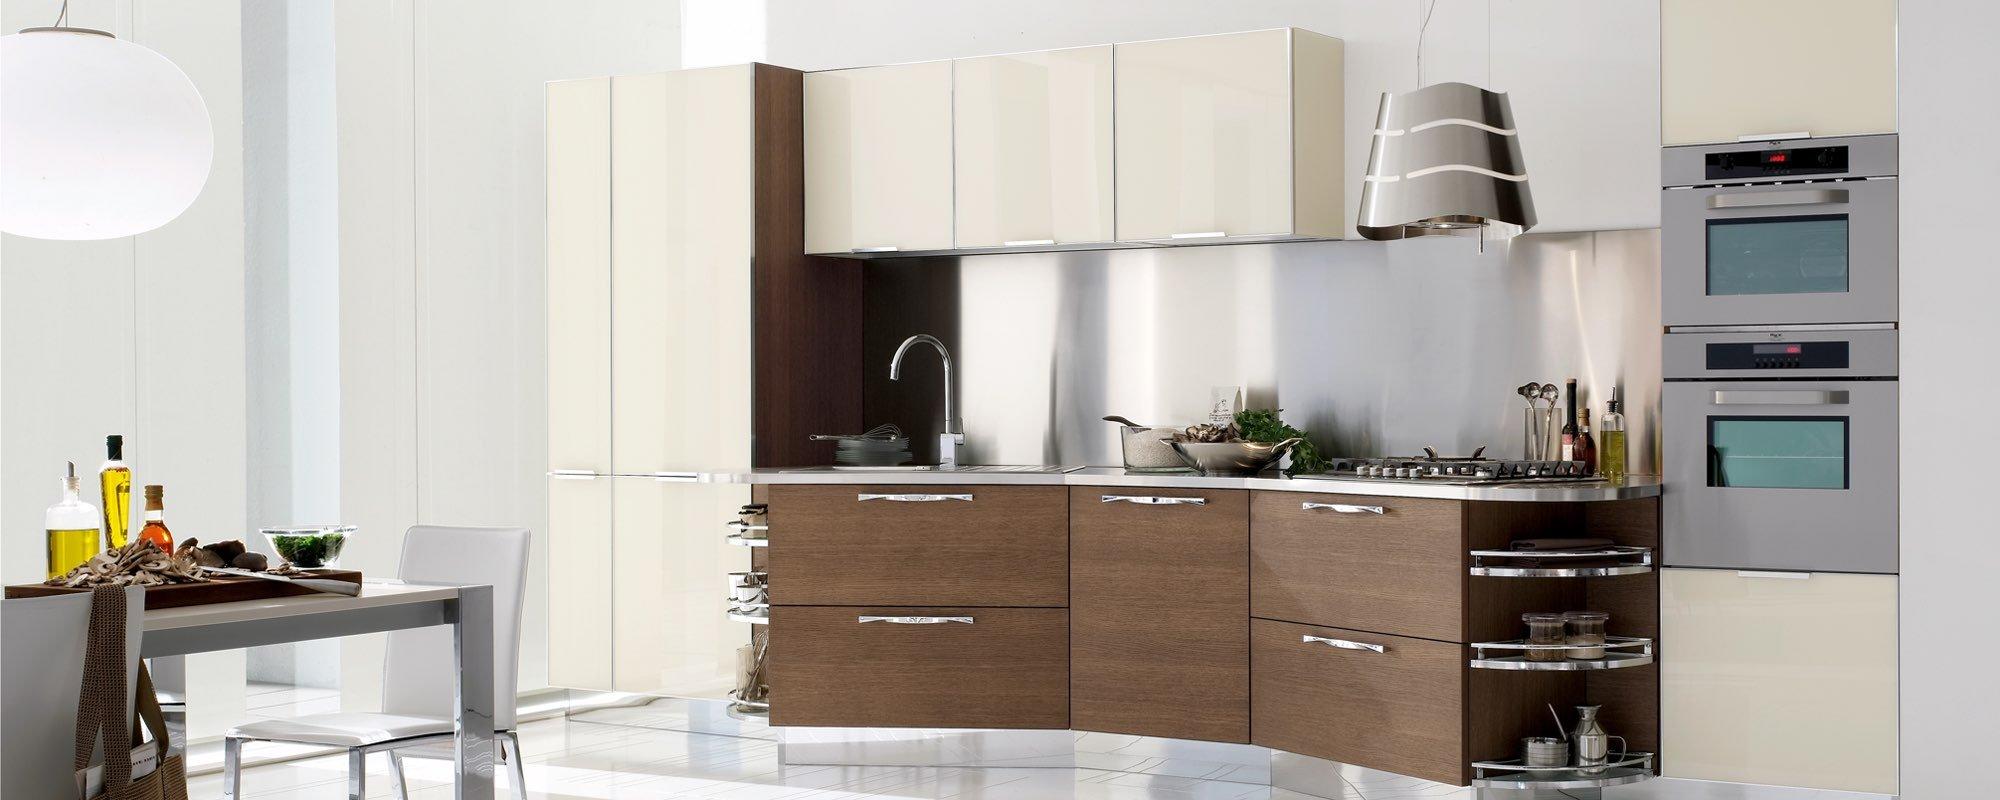 vista di mobili cucina casa moderna - Life